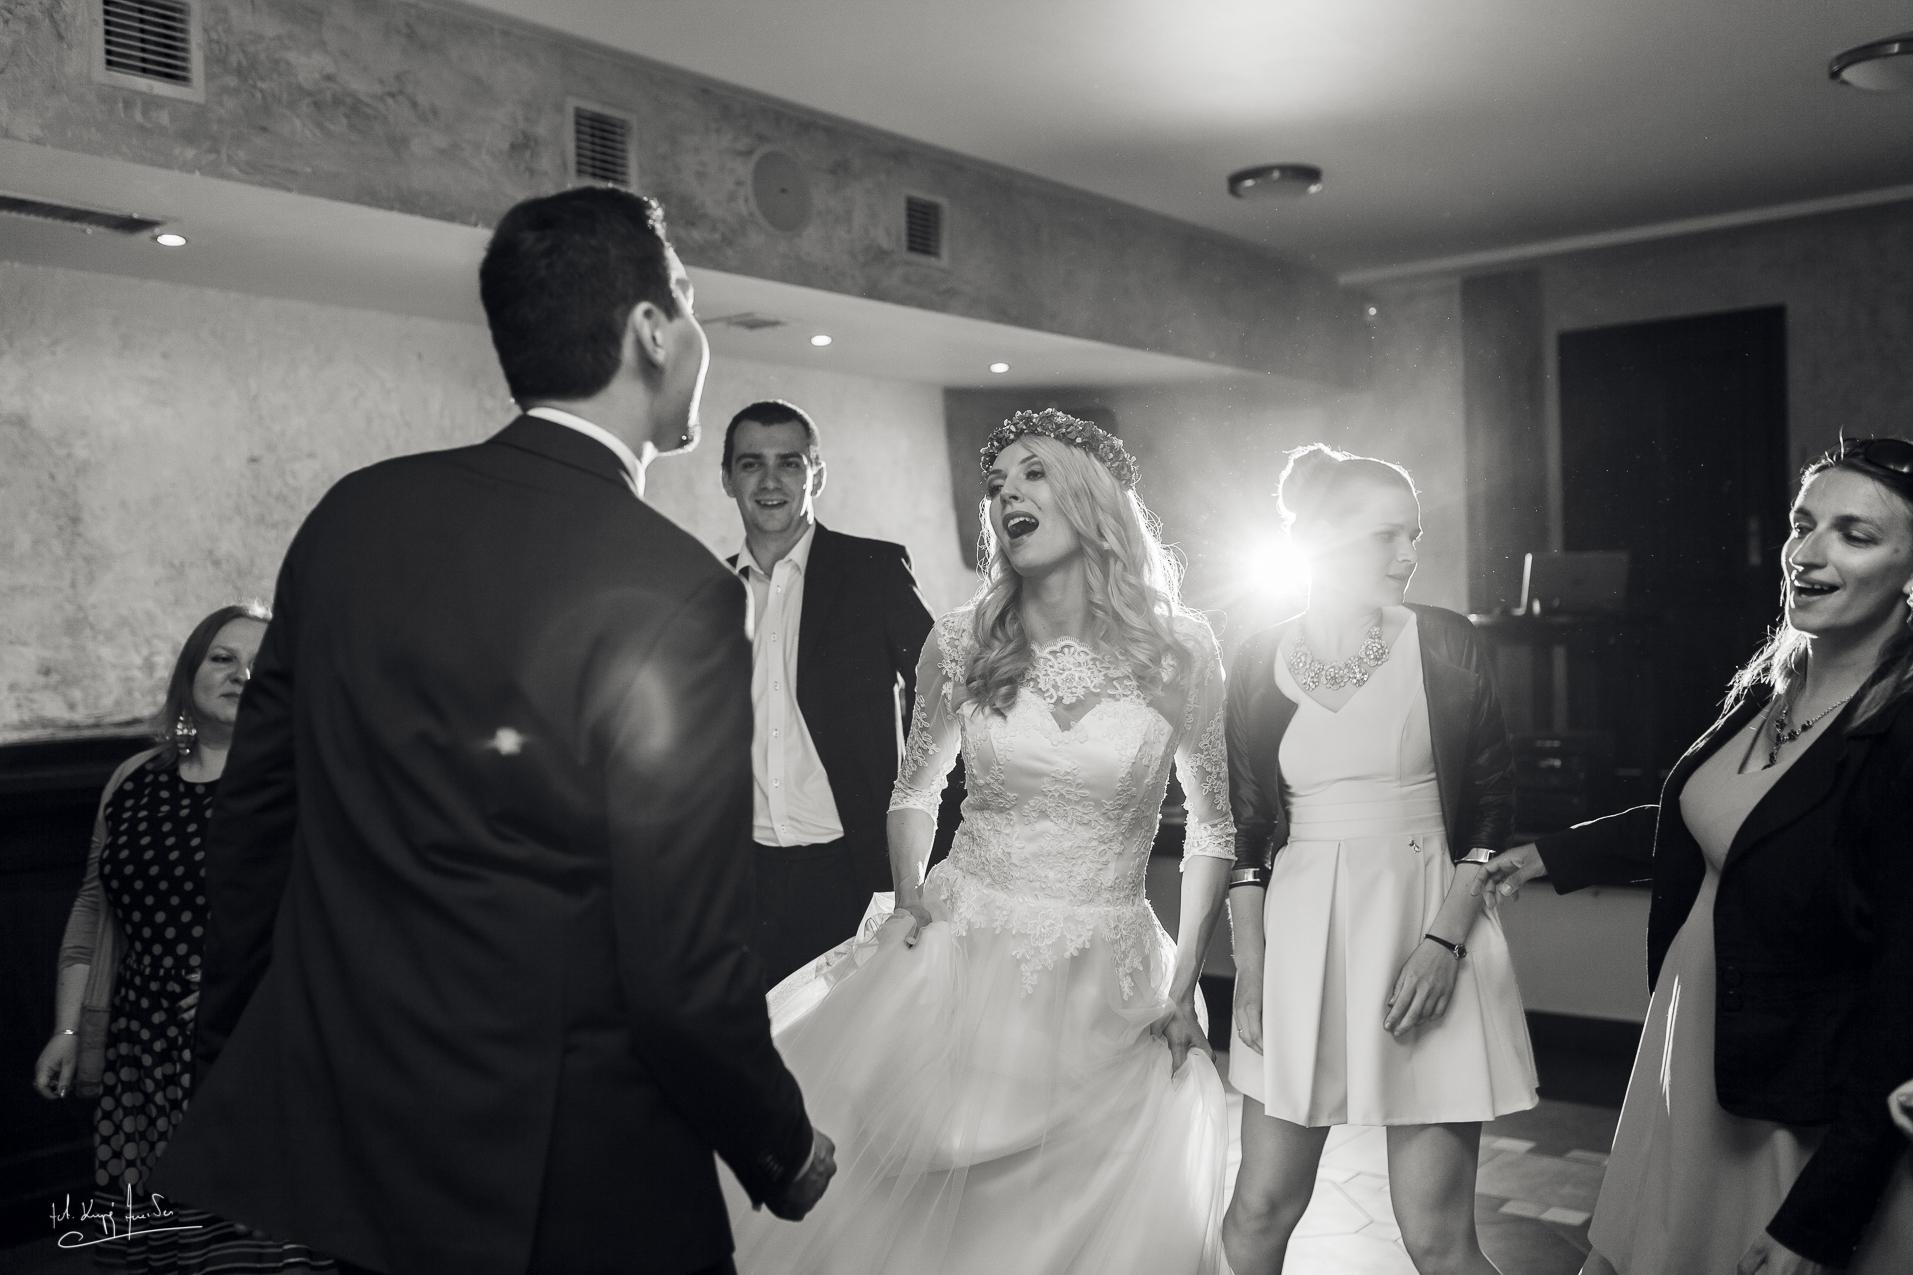 Ślub wesele szklarska poręba 35 Marta & Sławek